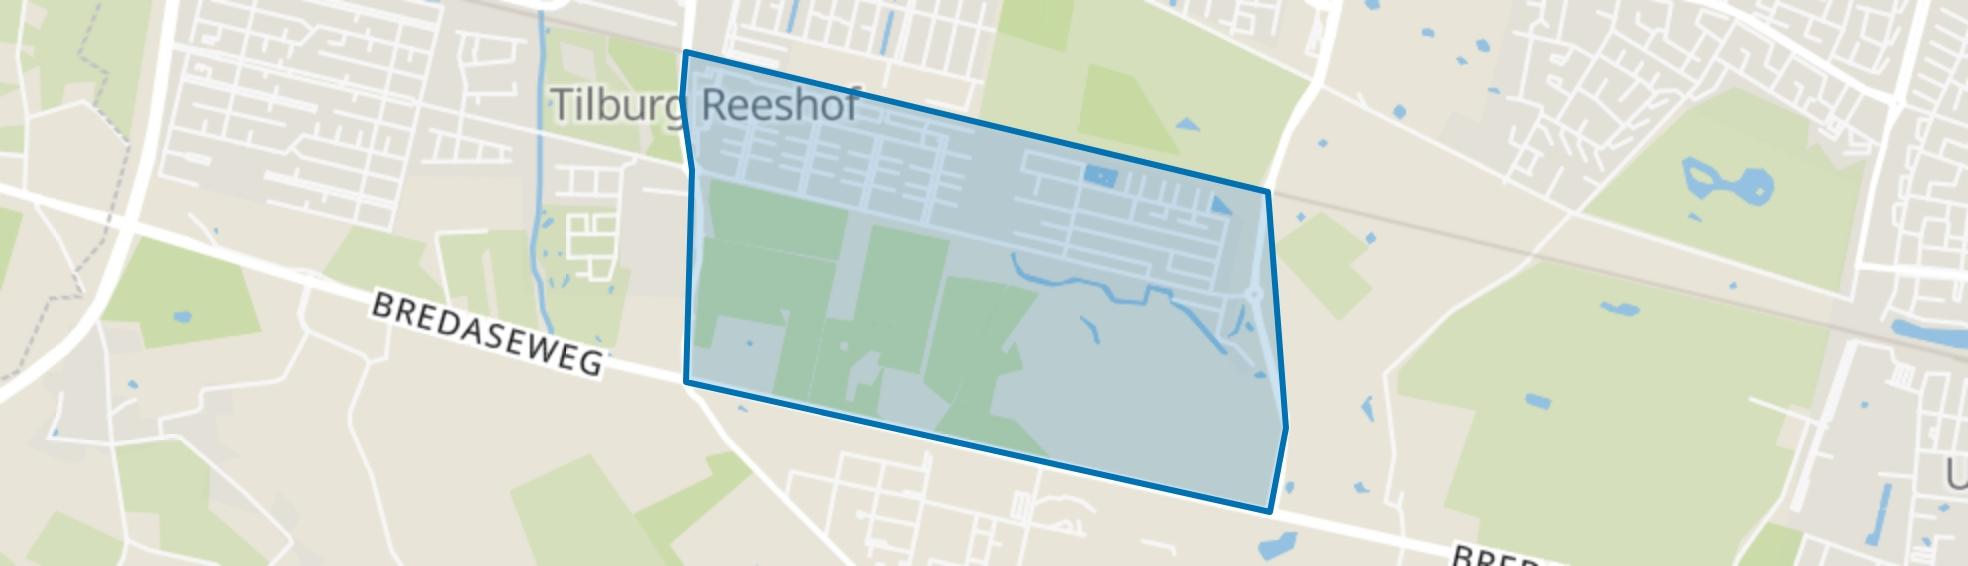 Witbrant, Tilburg map